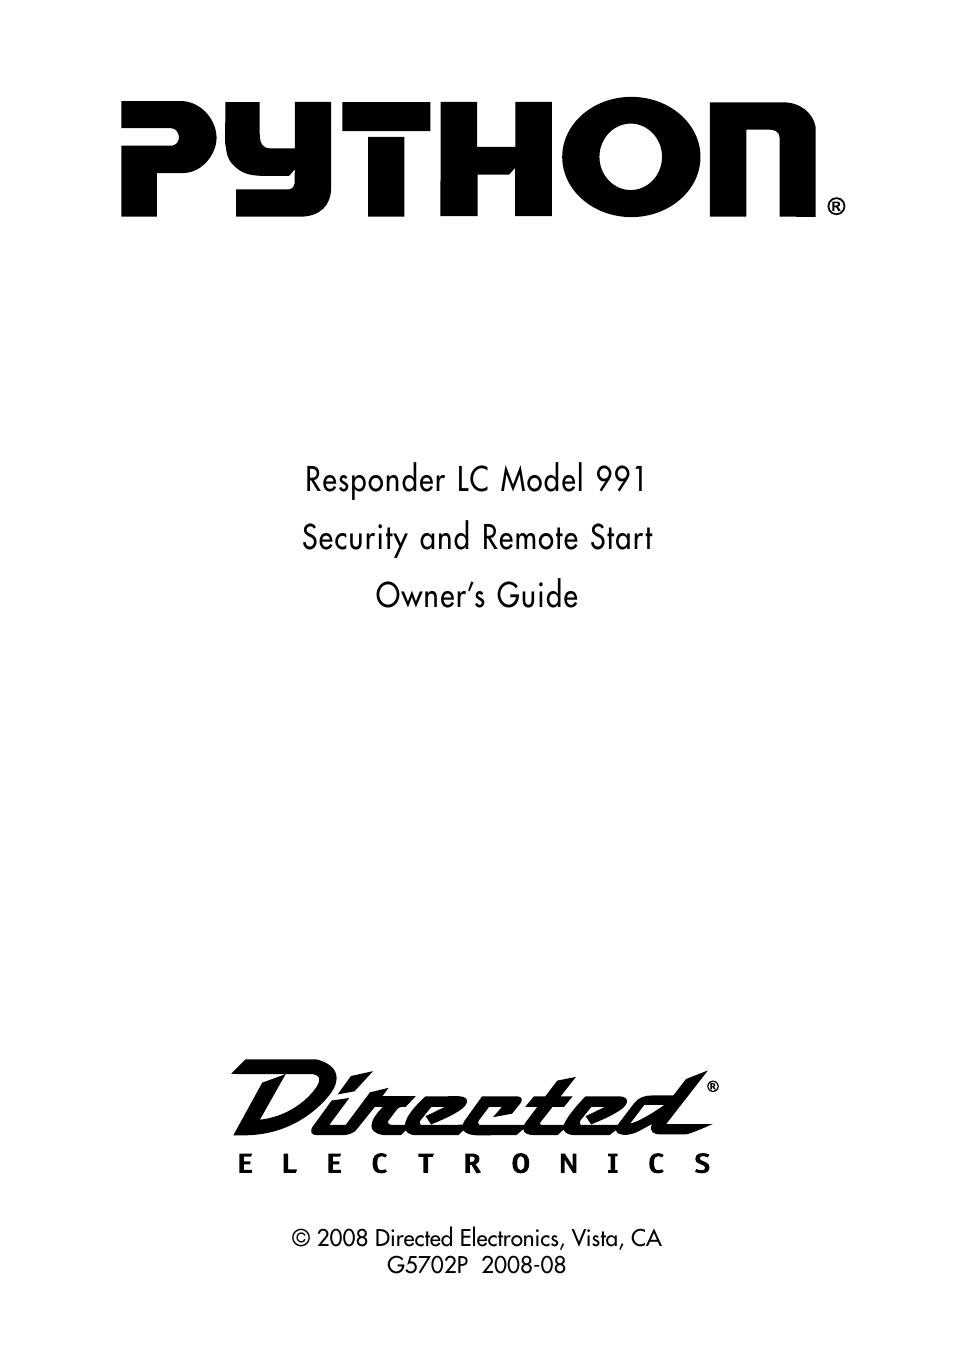 Manualguide Python 991 Installation Guide Wiring Diagram User Manual 60 Pages Rh Manualsdir Com